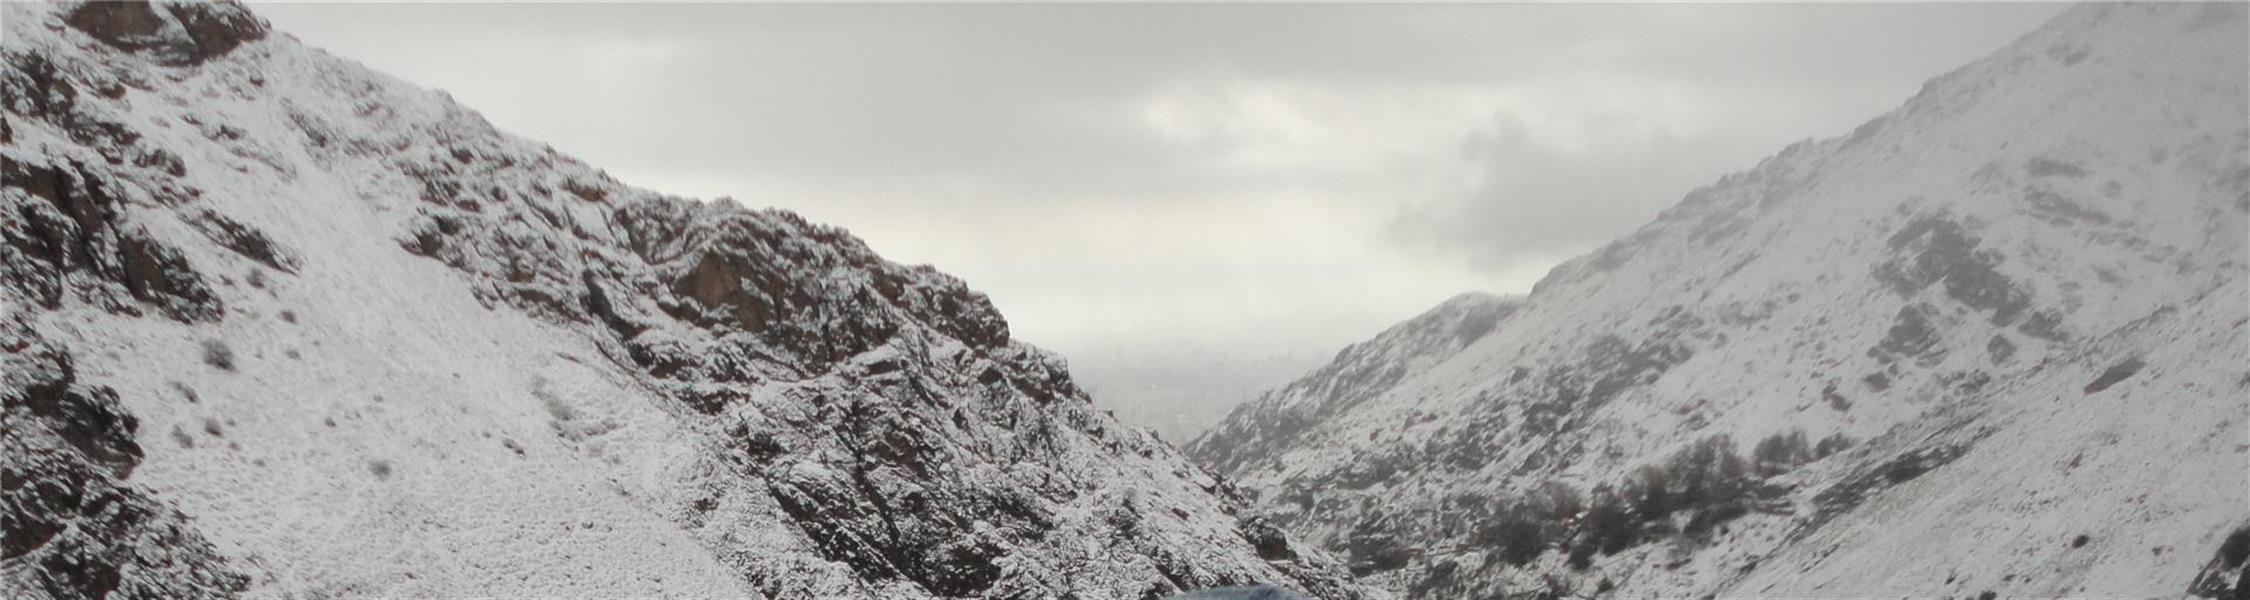 هنر عکاسی زمستان Art is siCk